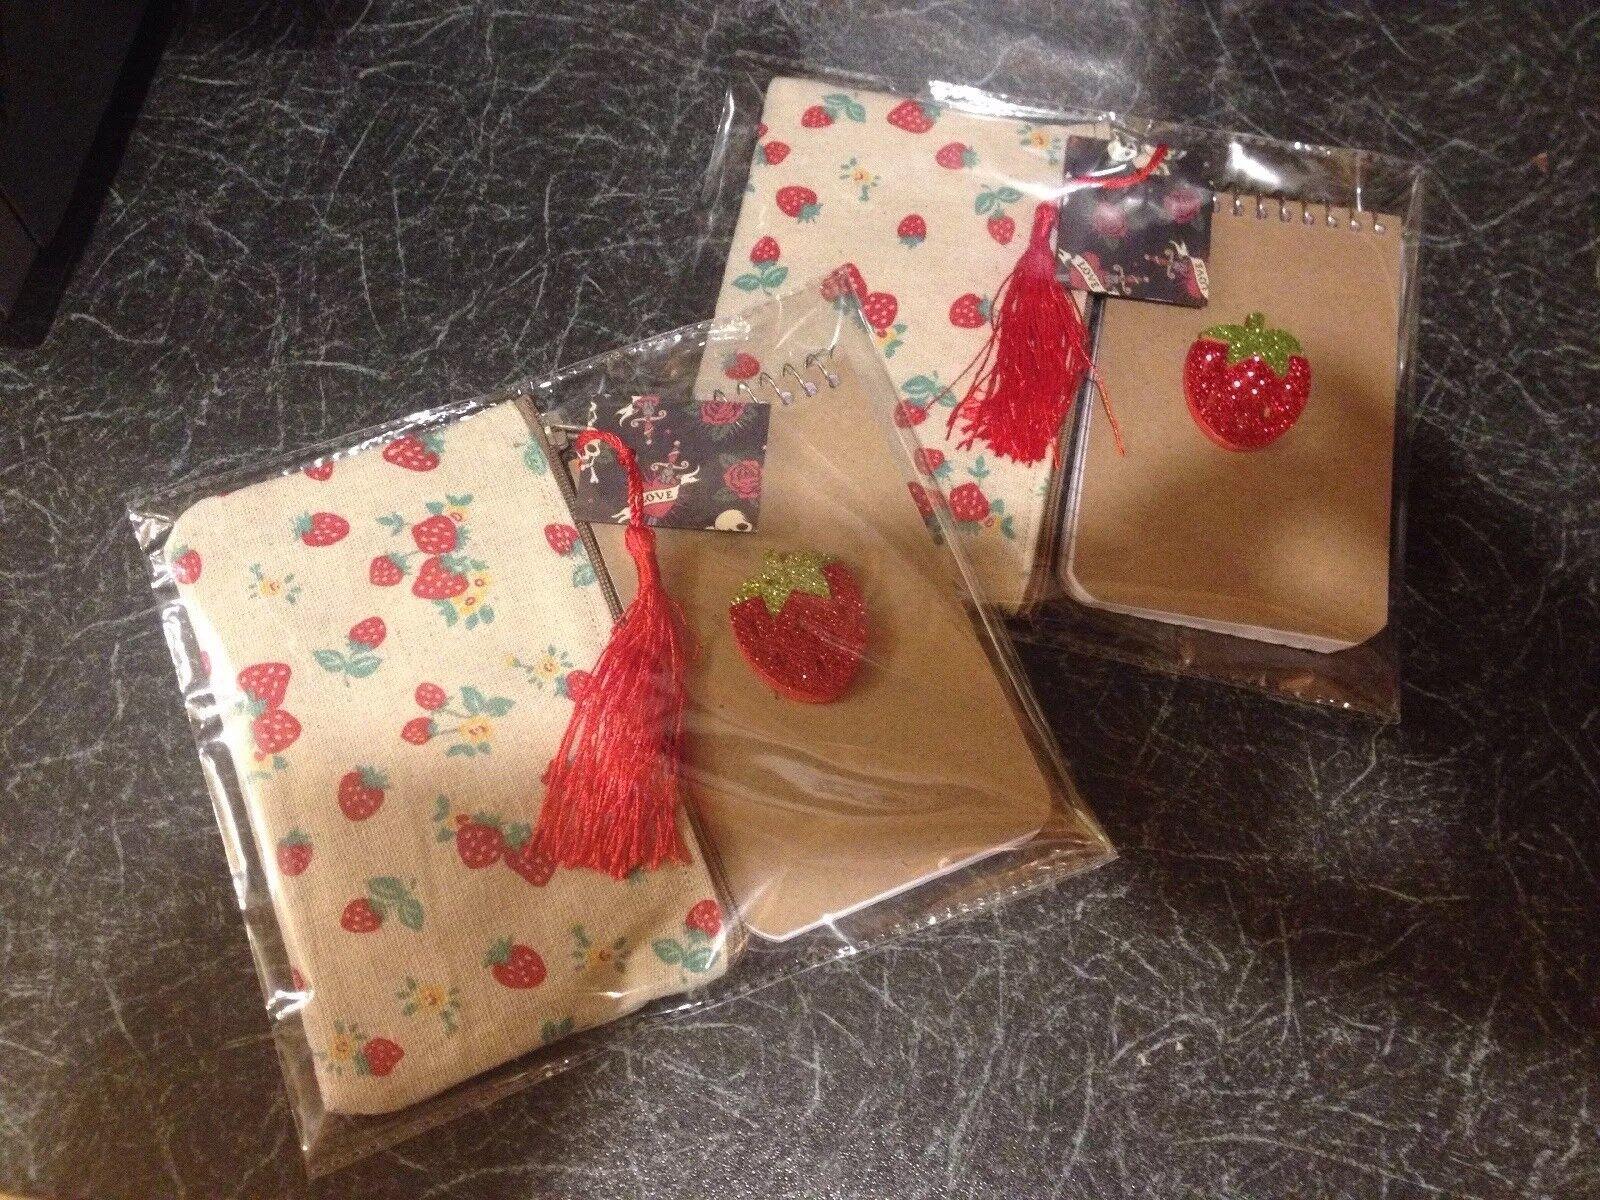 Retro Vintage Strawberry Cosmetic Bag +Glitter Notebook Rockabilly 2pc Gift Set